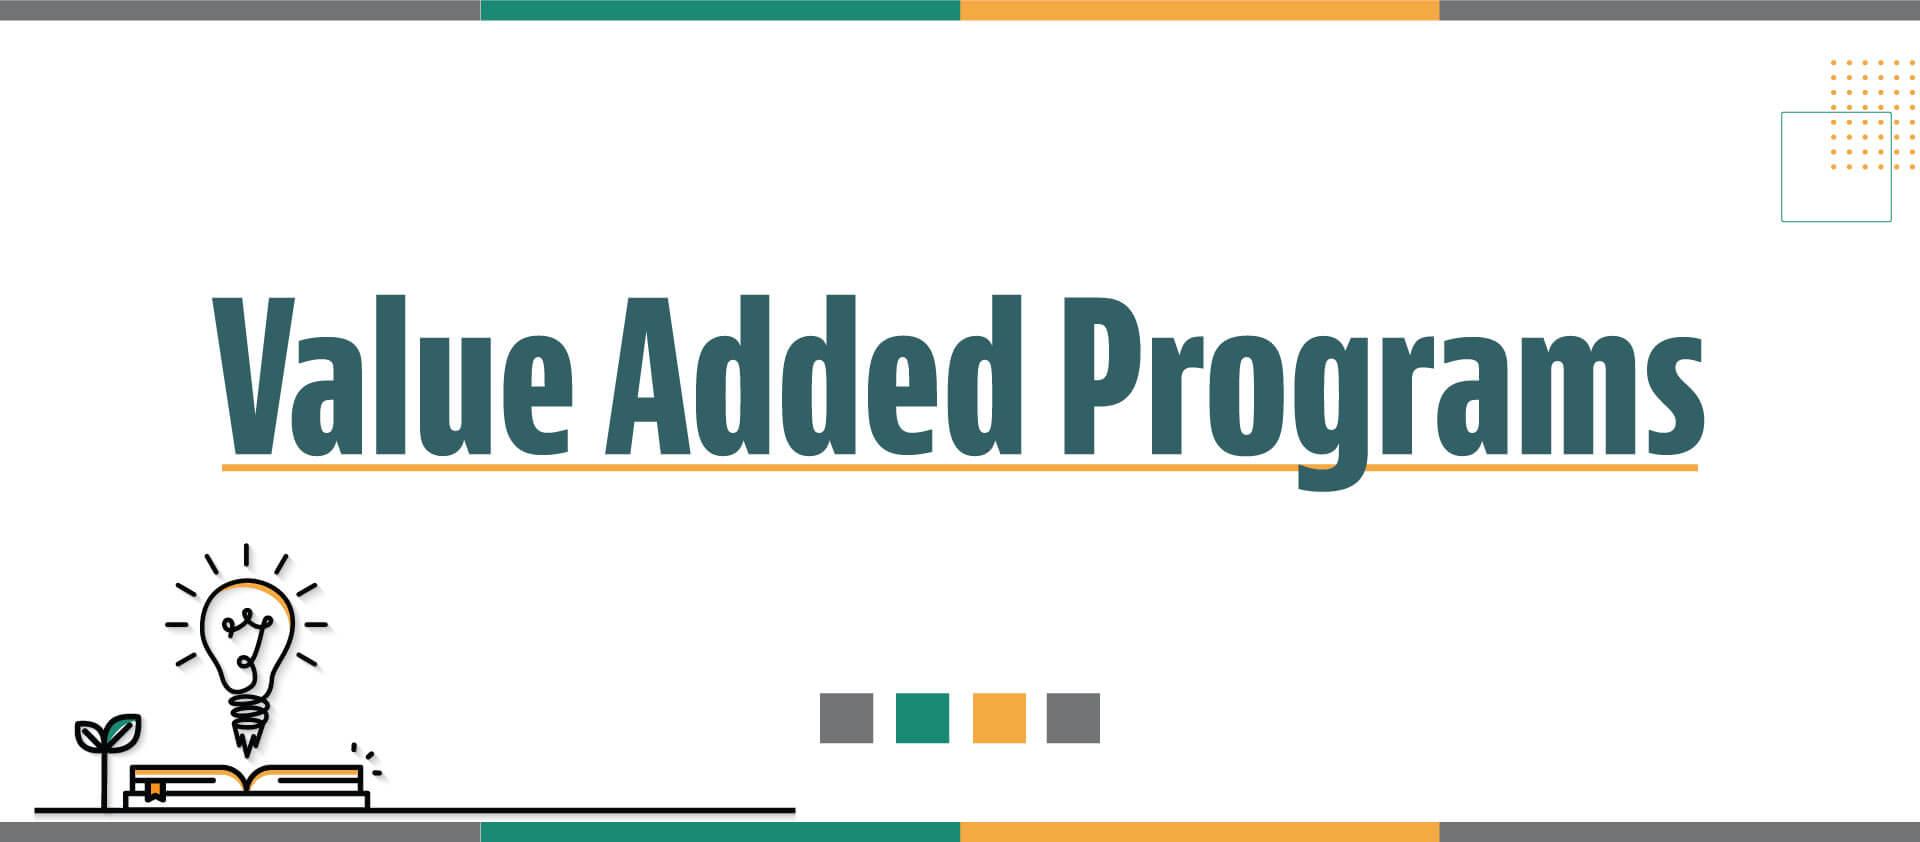 Value Added Programs